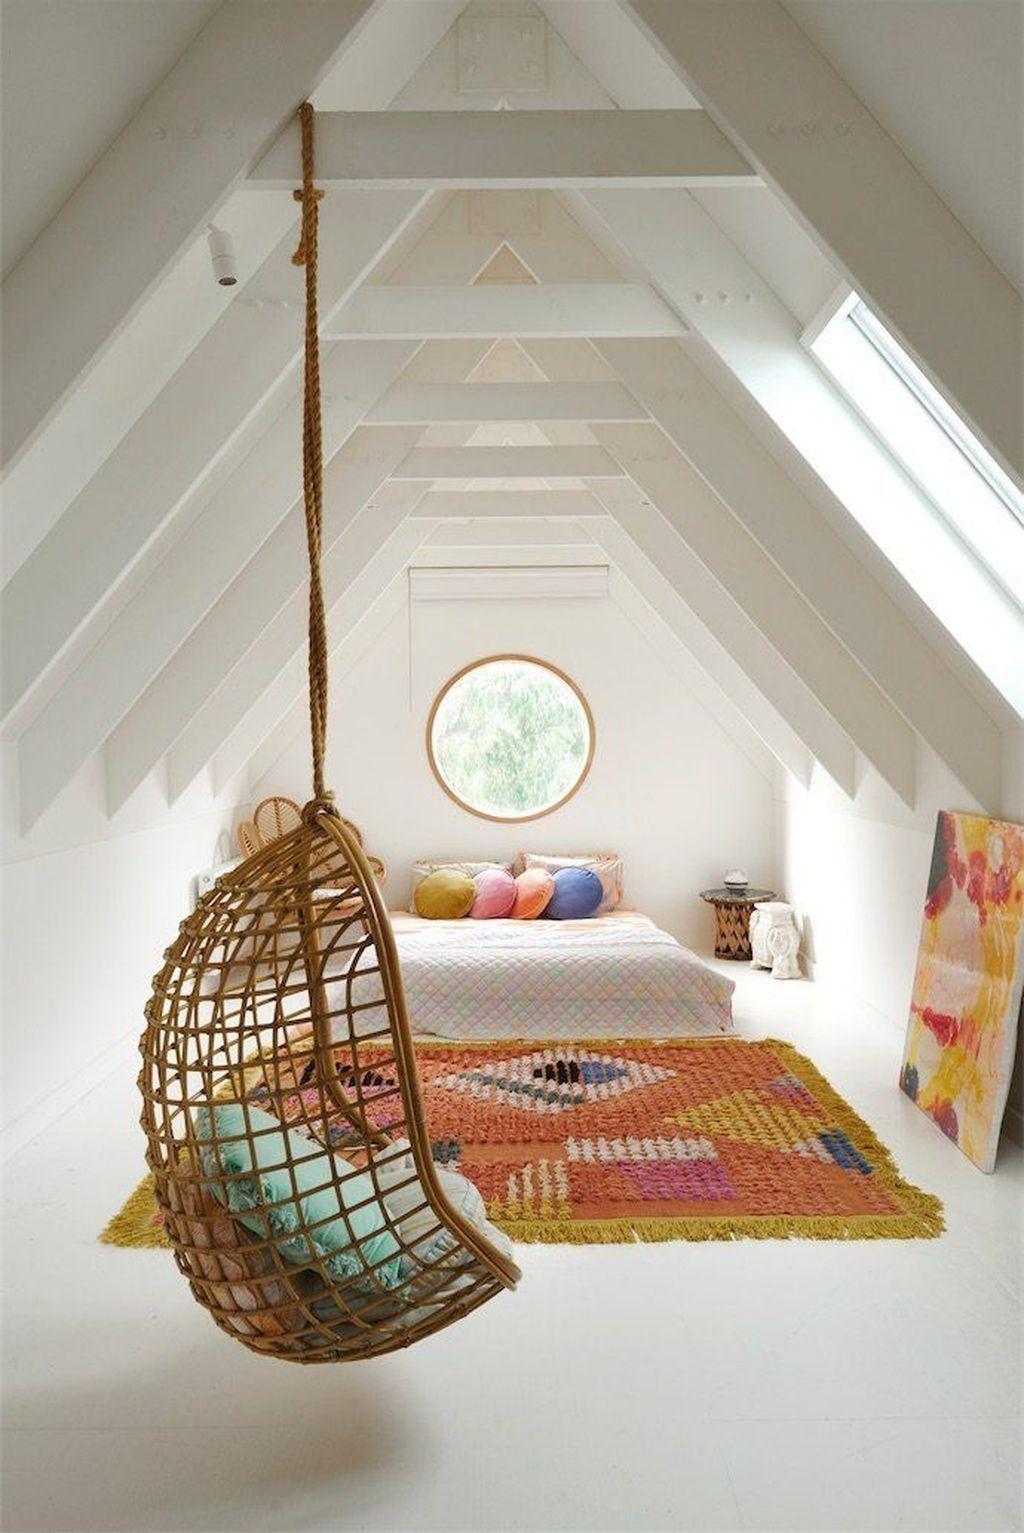 10 Beauteous Attic Storage 280 Ideas Ideias Para Sotao Designs De Quarto Ideias Para Interiores